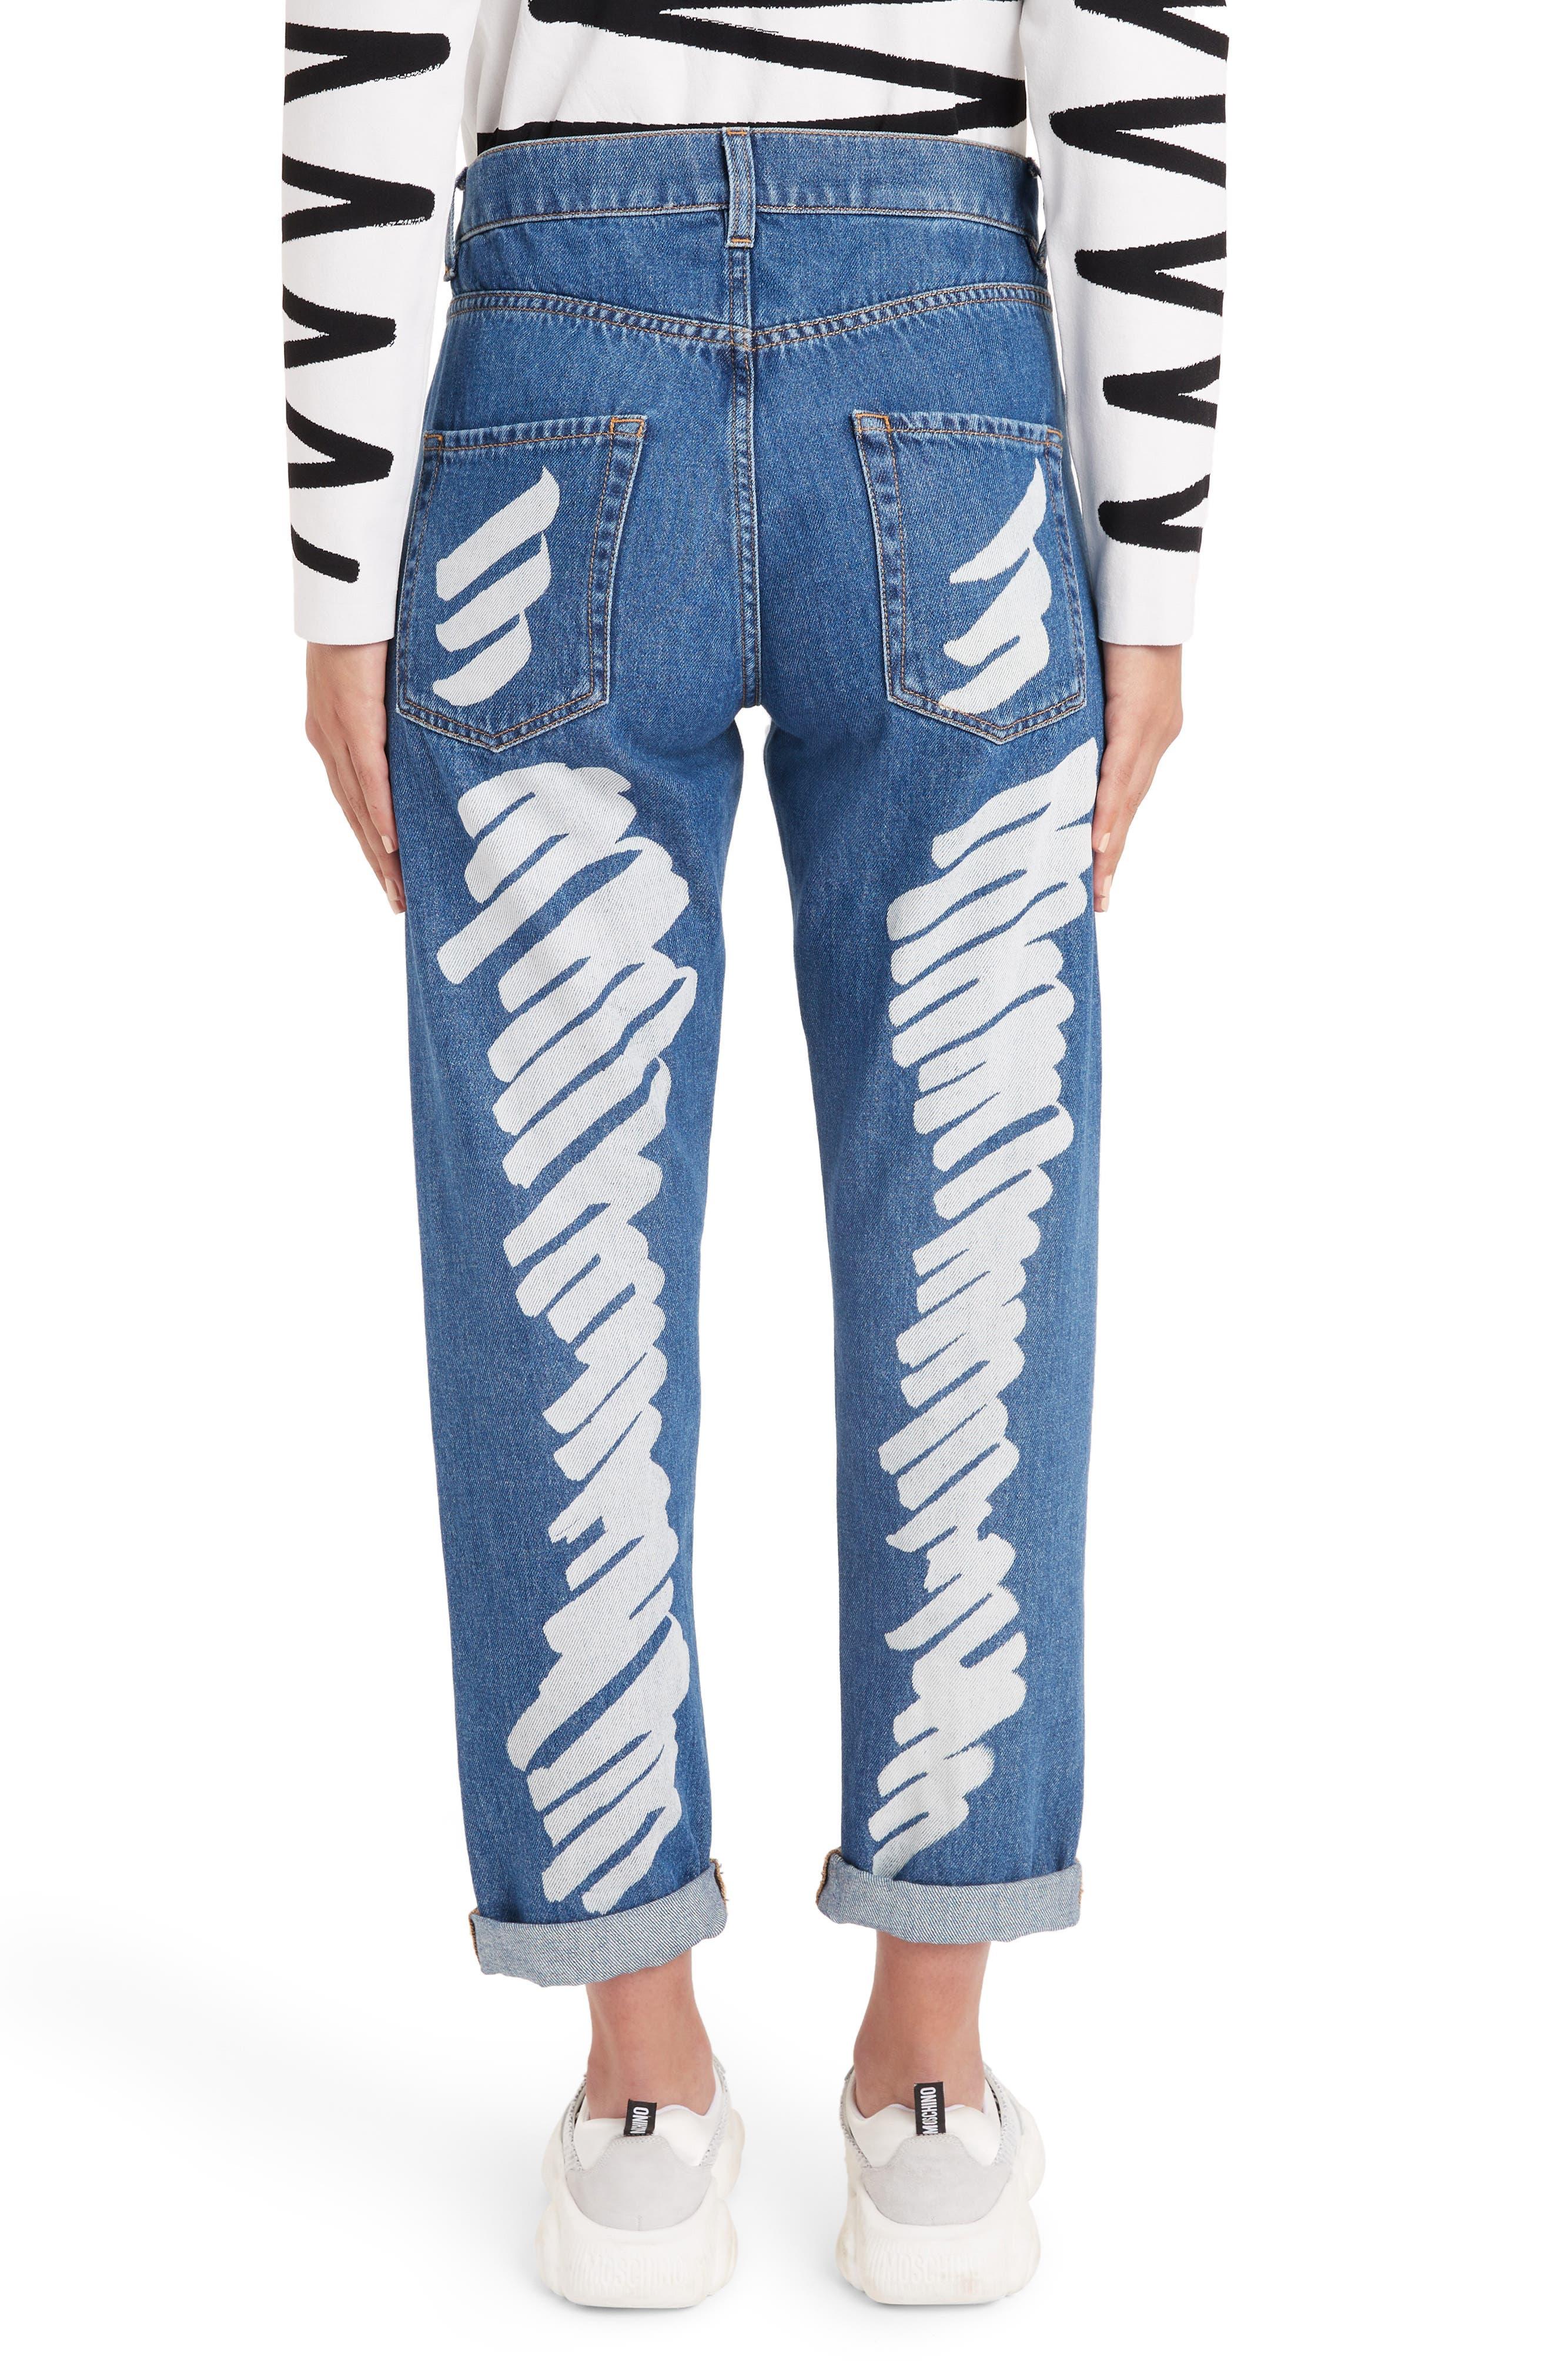 MOSCHINO, Scribble Straight Leg Jeans, Alternate thumbnail 2, color, DENIM